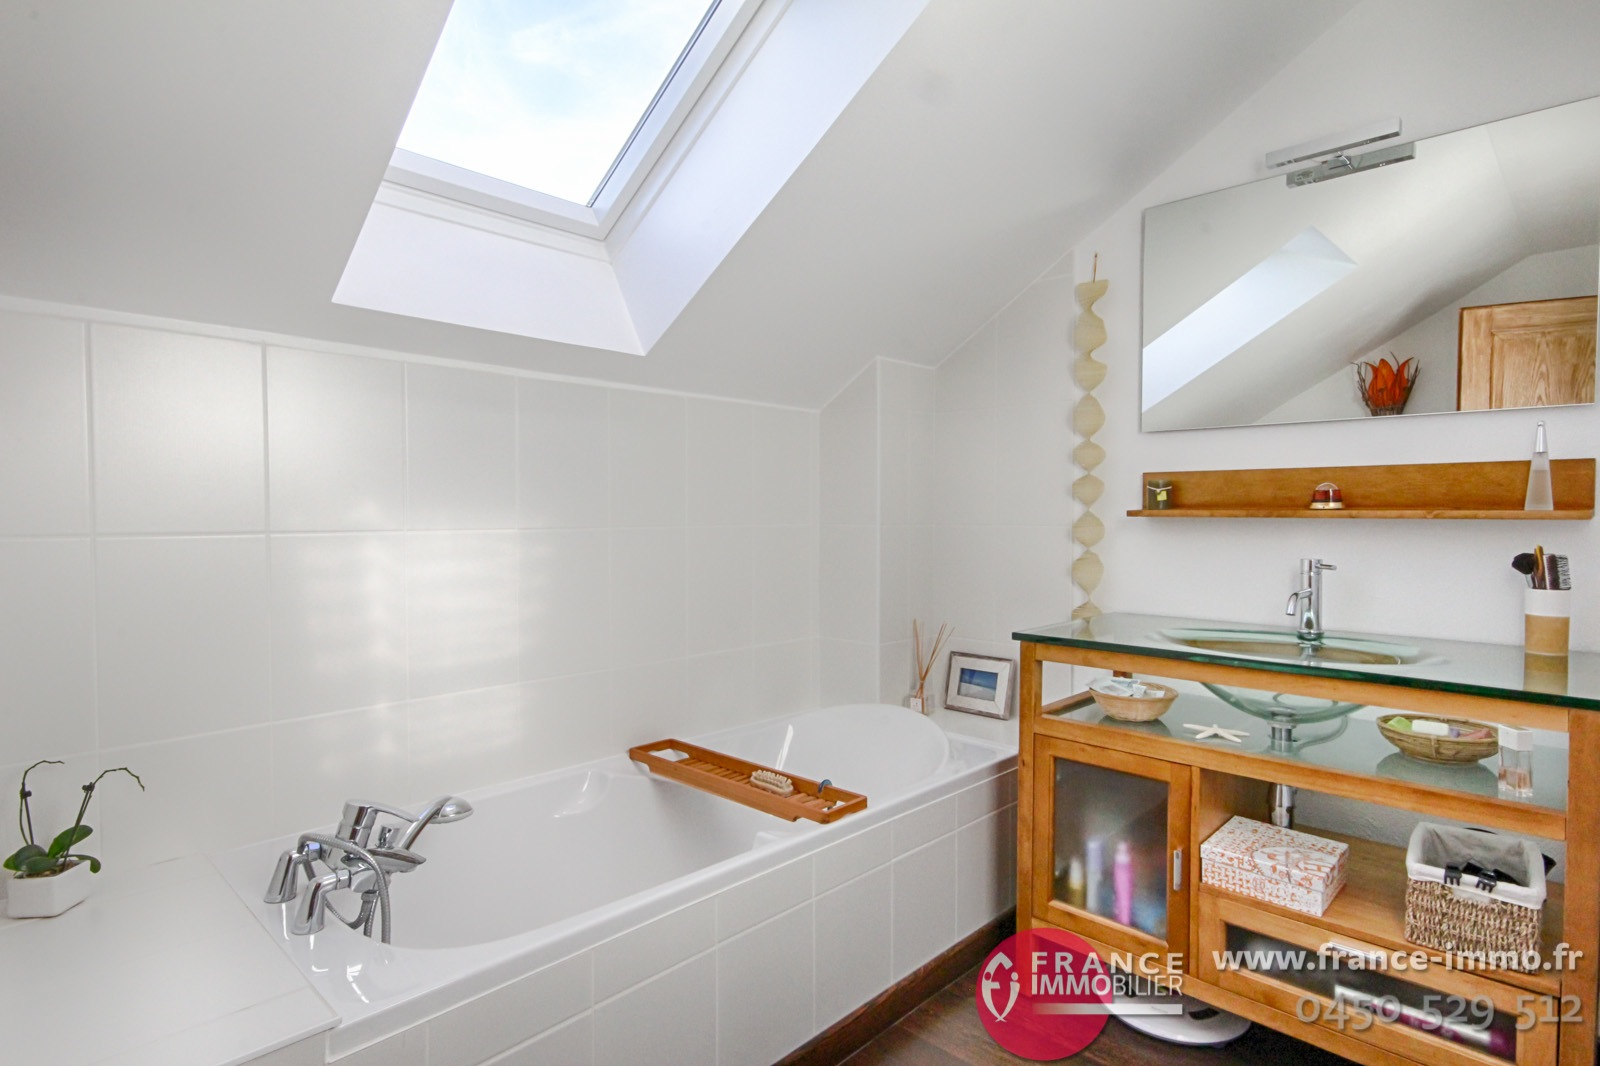 exclusivite superbe villa contemporaine rcente sur axe genve agence immobili re france. Black Bedroom Furniture Sets. Home Design Ideas